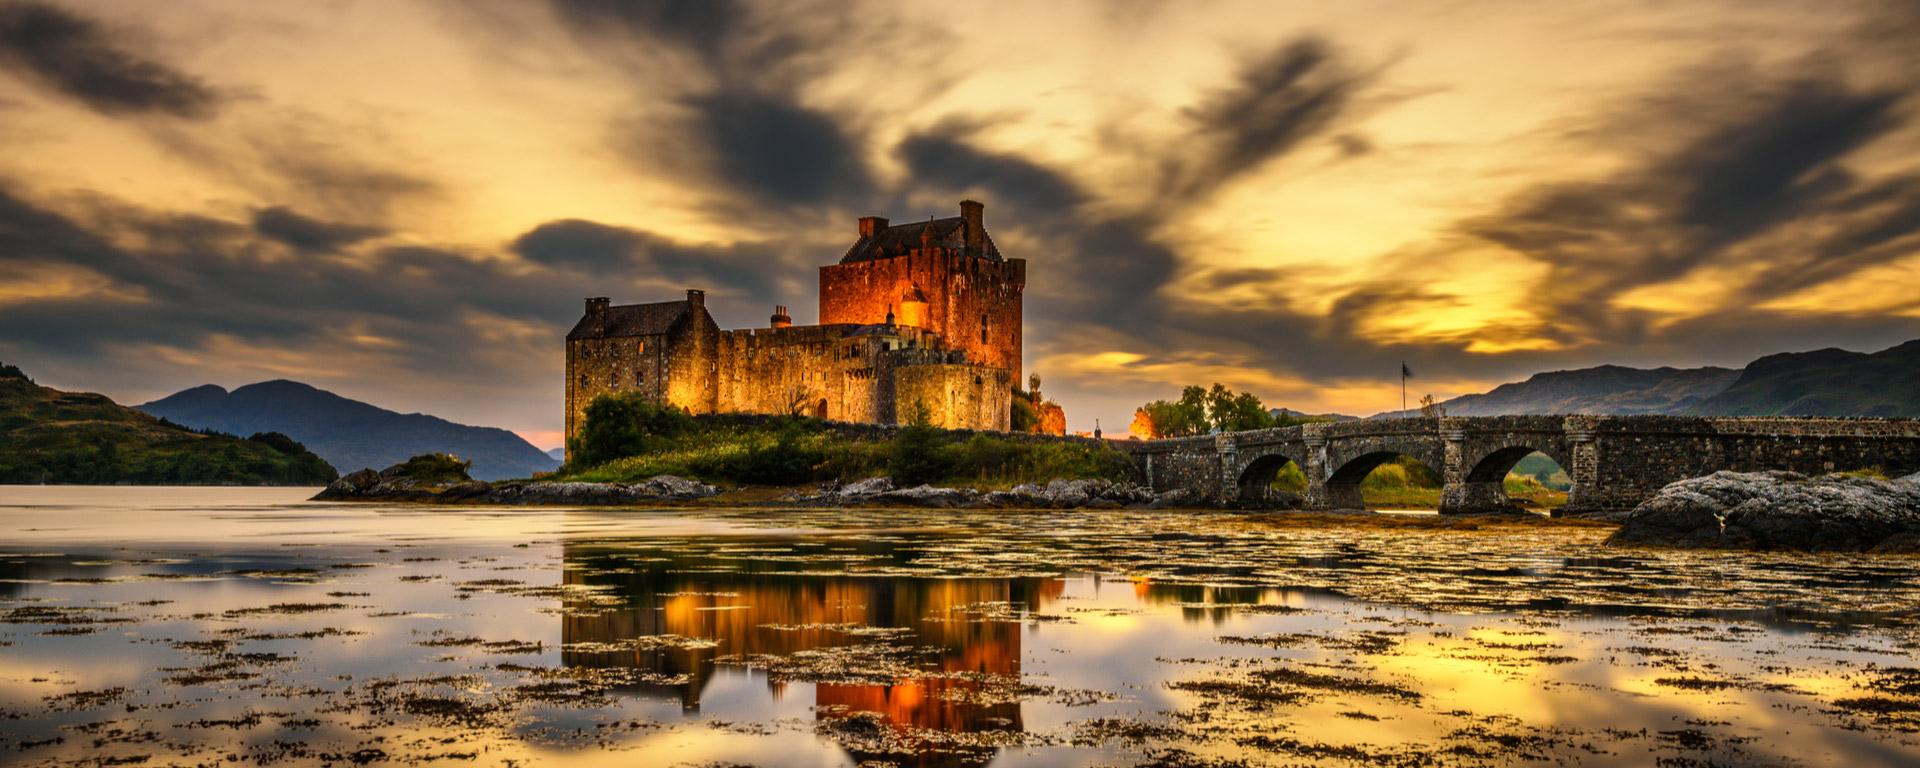 Sunset over Eilean Donan Castle Scotland